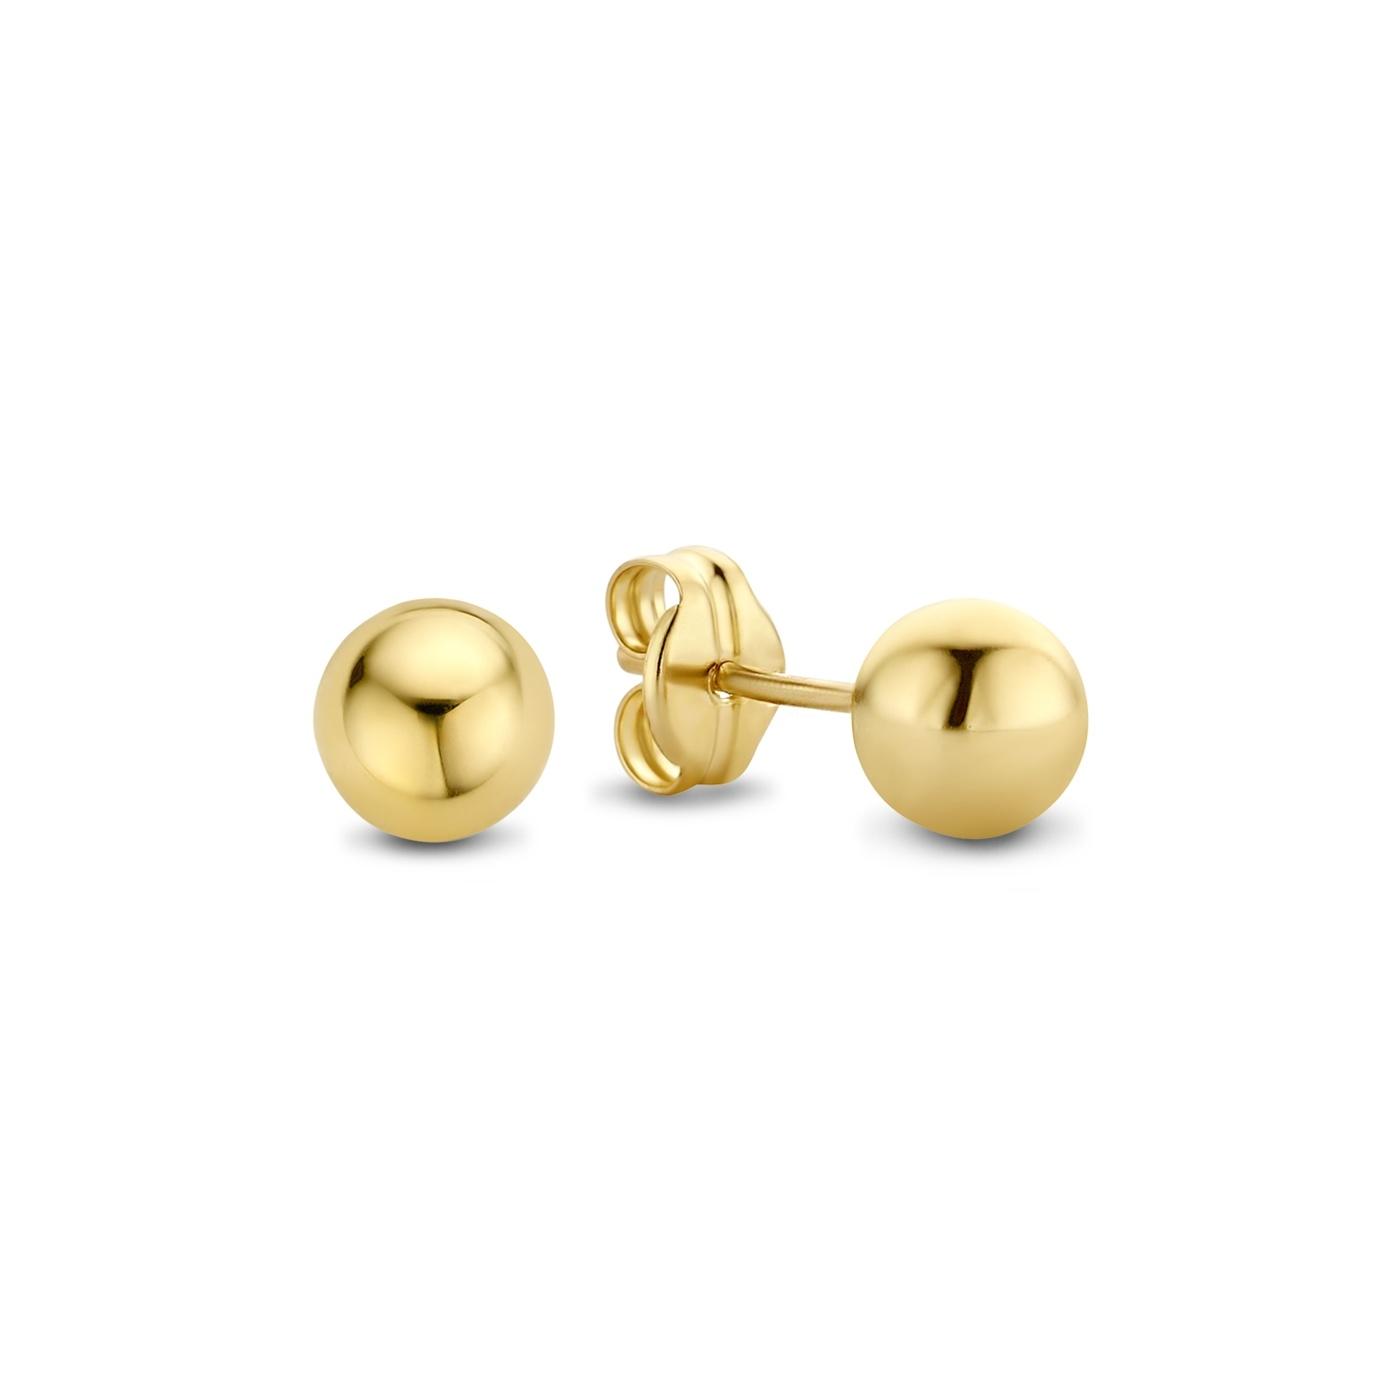 Isabel Bernard Rivoli Coco 14 karat gold ear studs with sphere